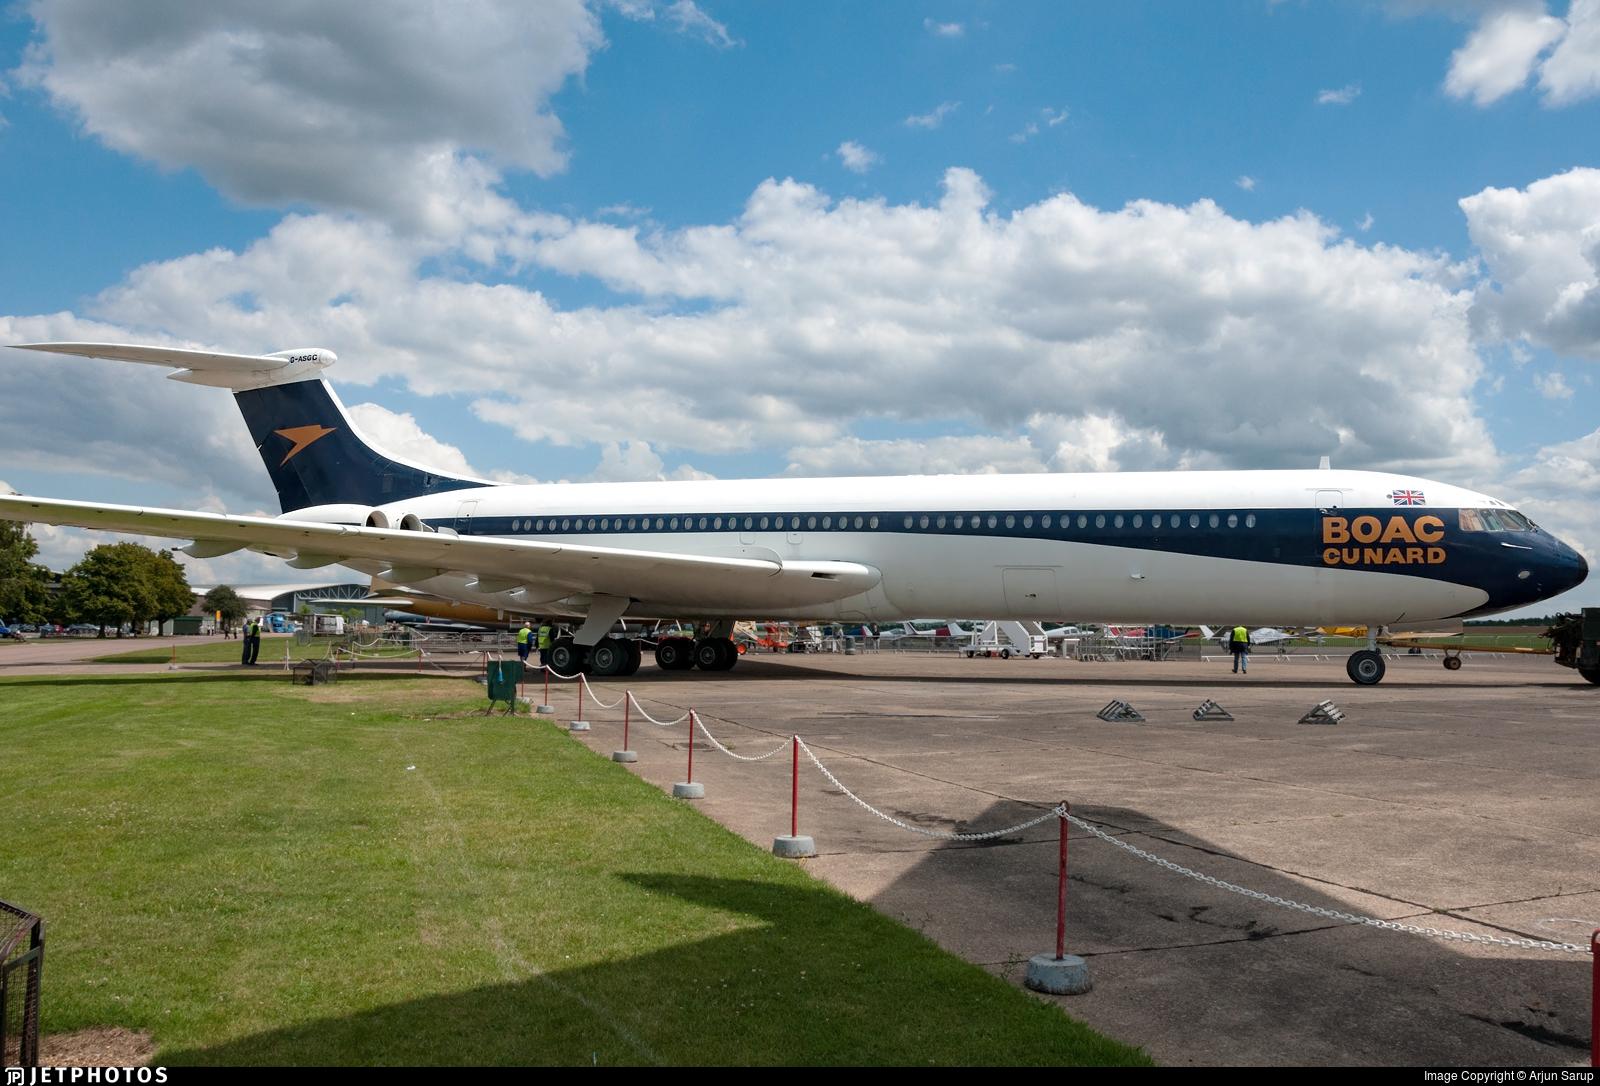 G-ASGC - Vickers Super VC-10 - British Overseas Airways Corporation (BOAC)